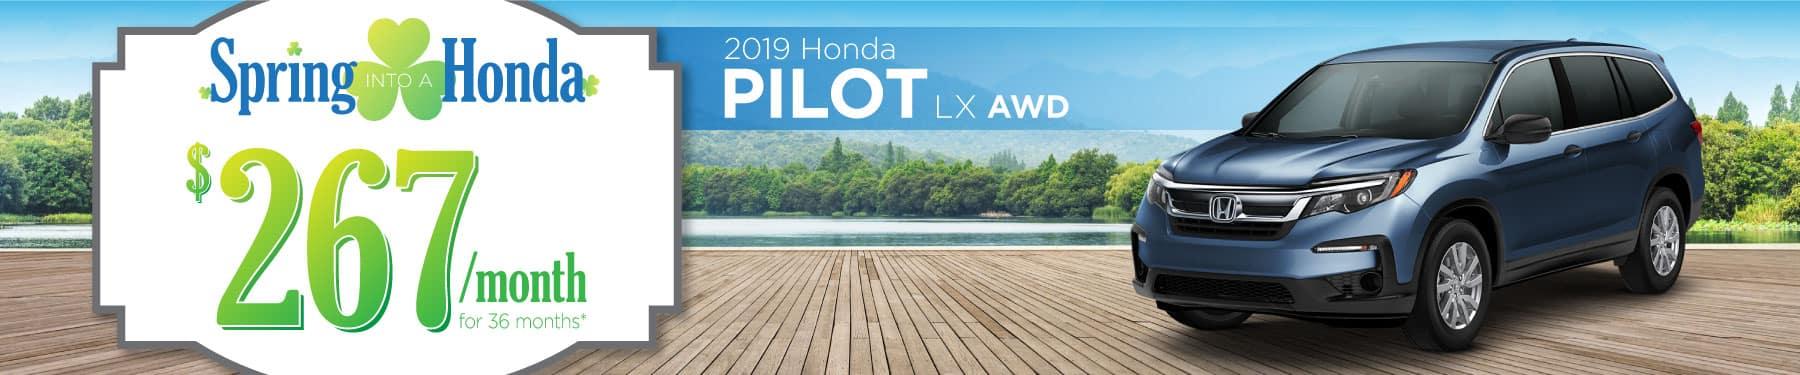 Header Photo of the 2019 Honda Pilot